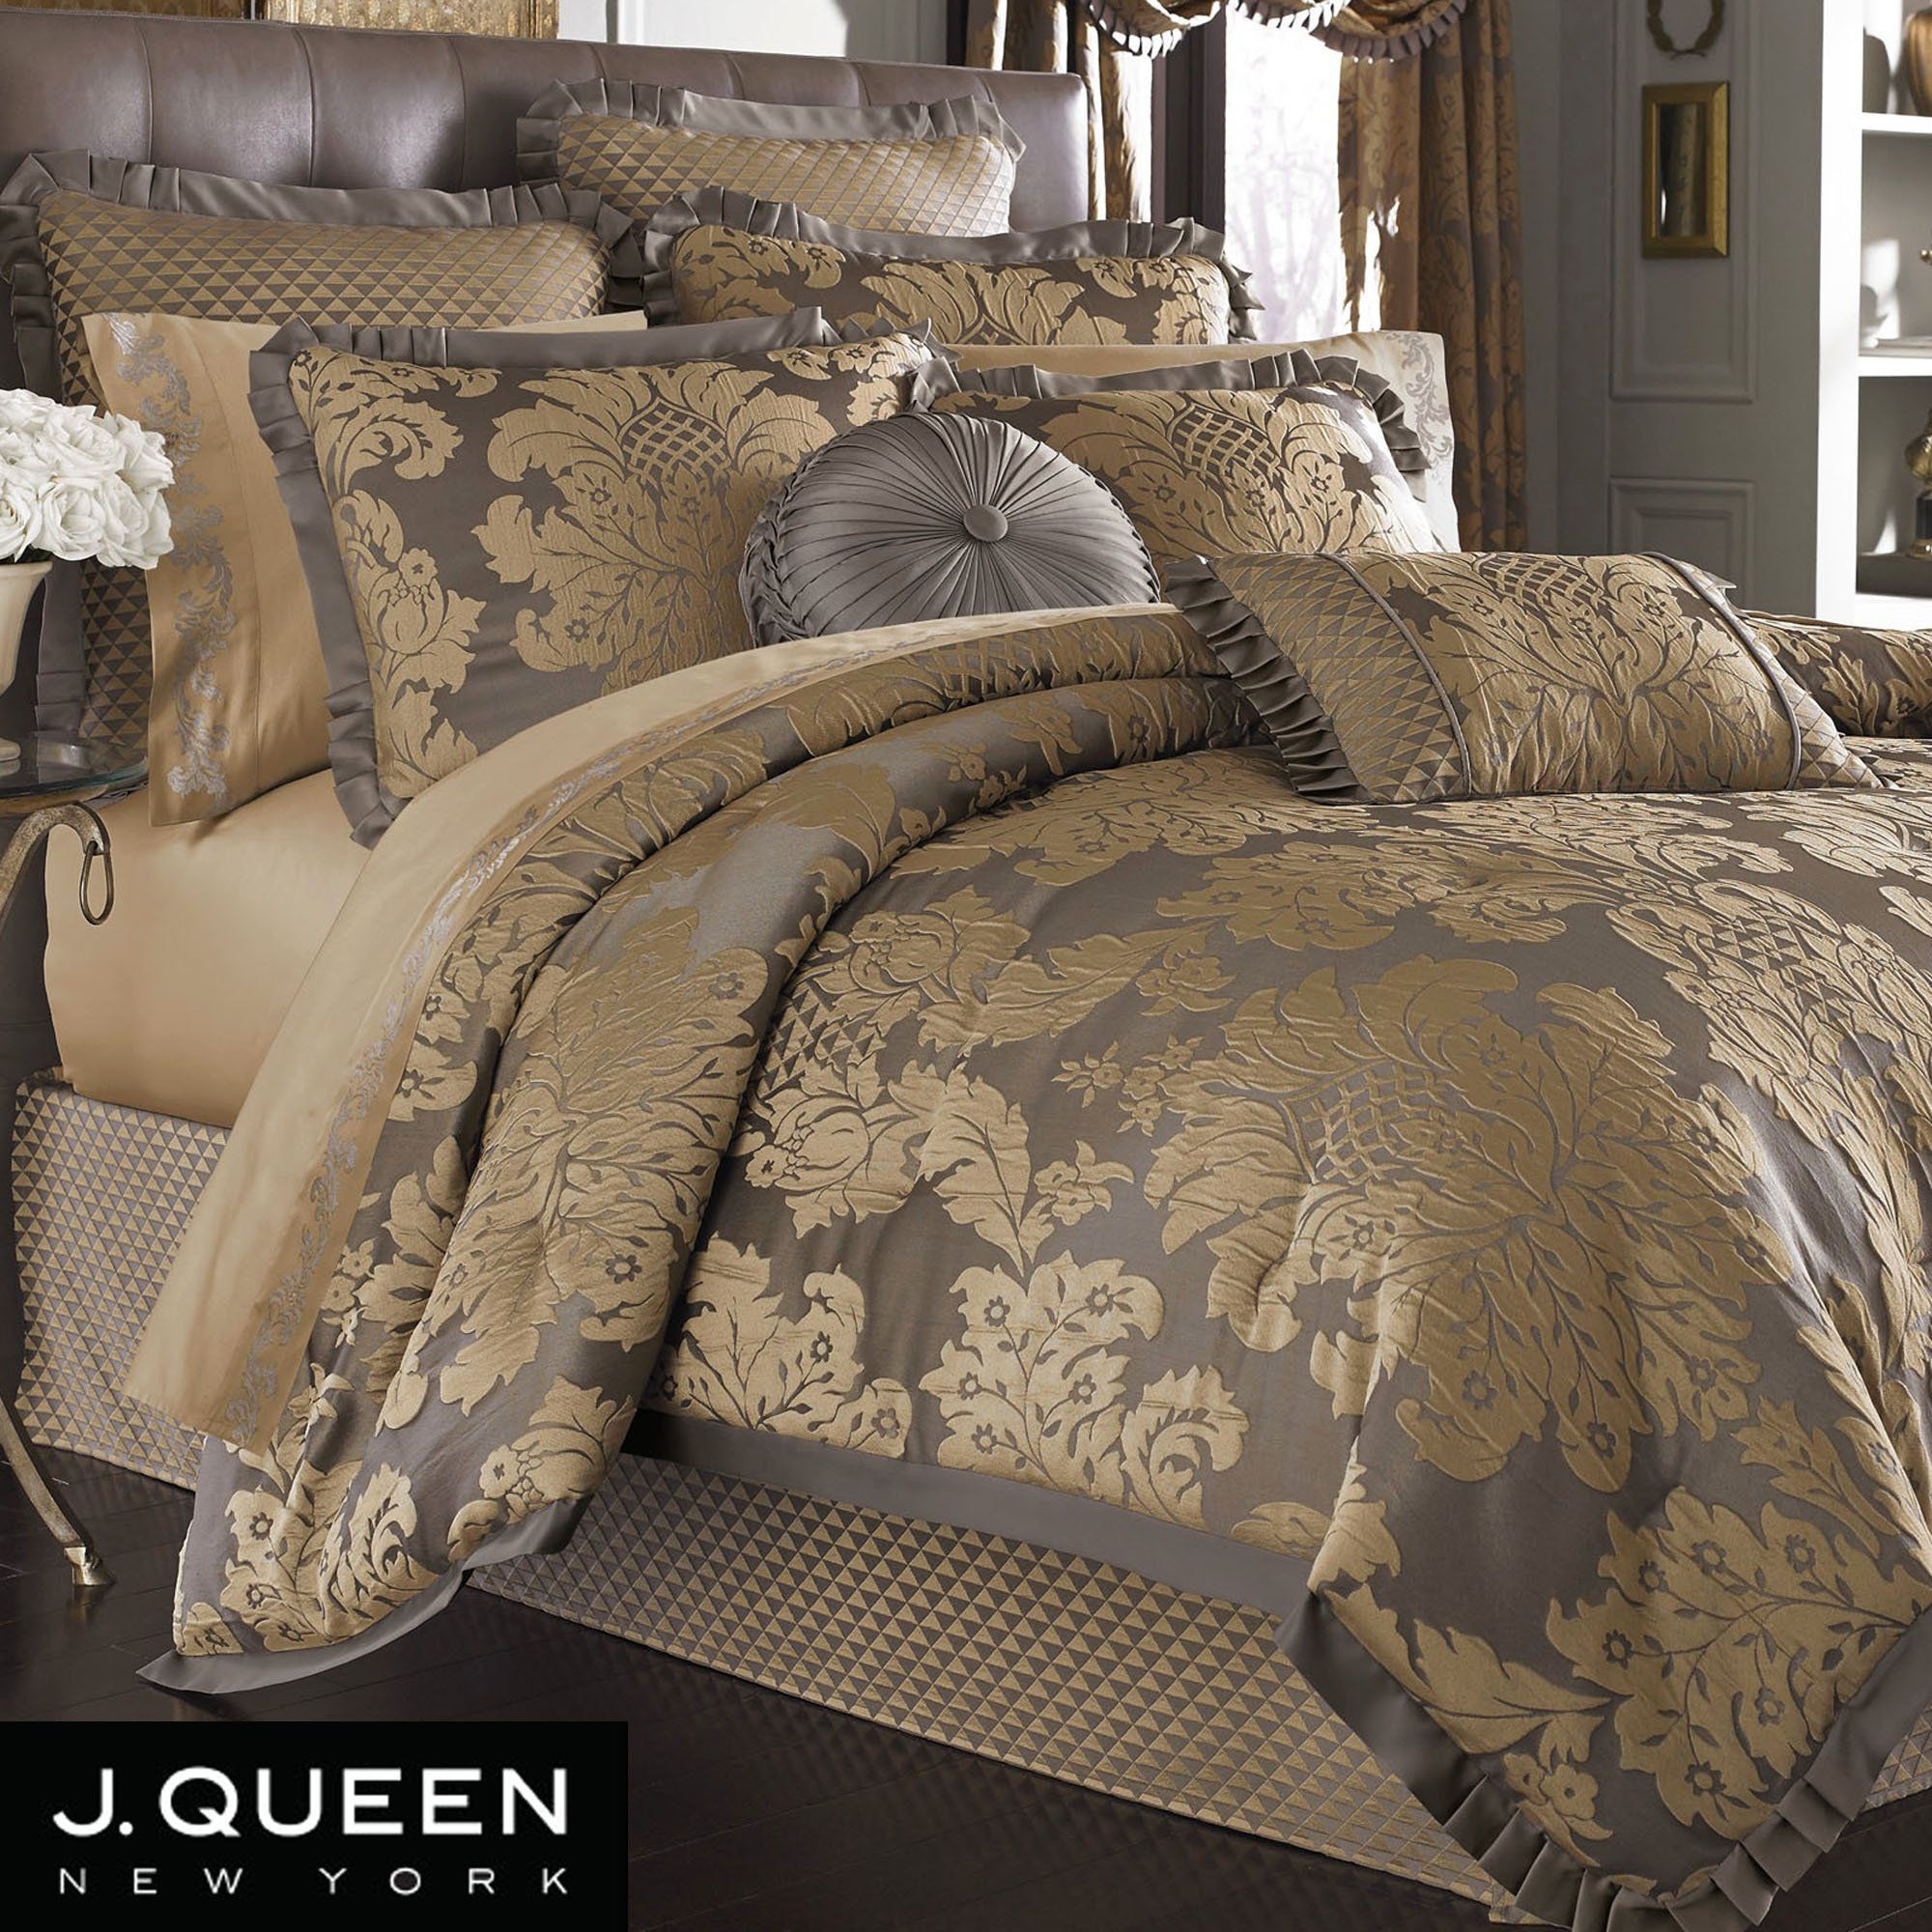 Chris Madden Bedding Magnolia Comforter Set Jcpenney